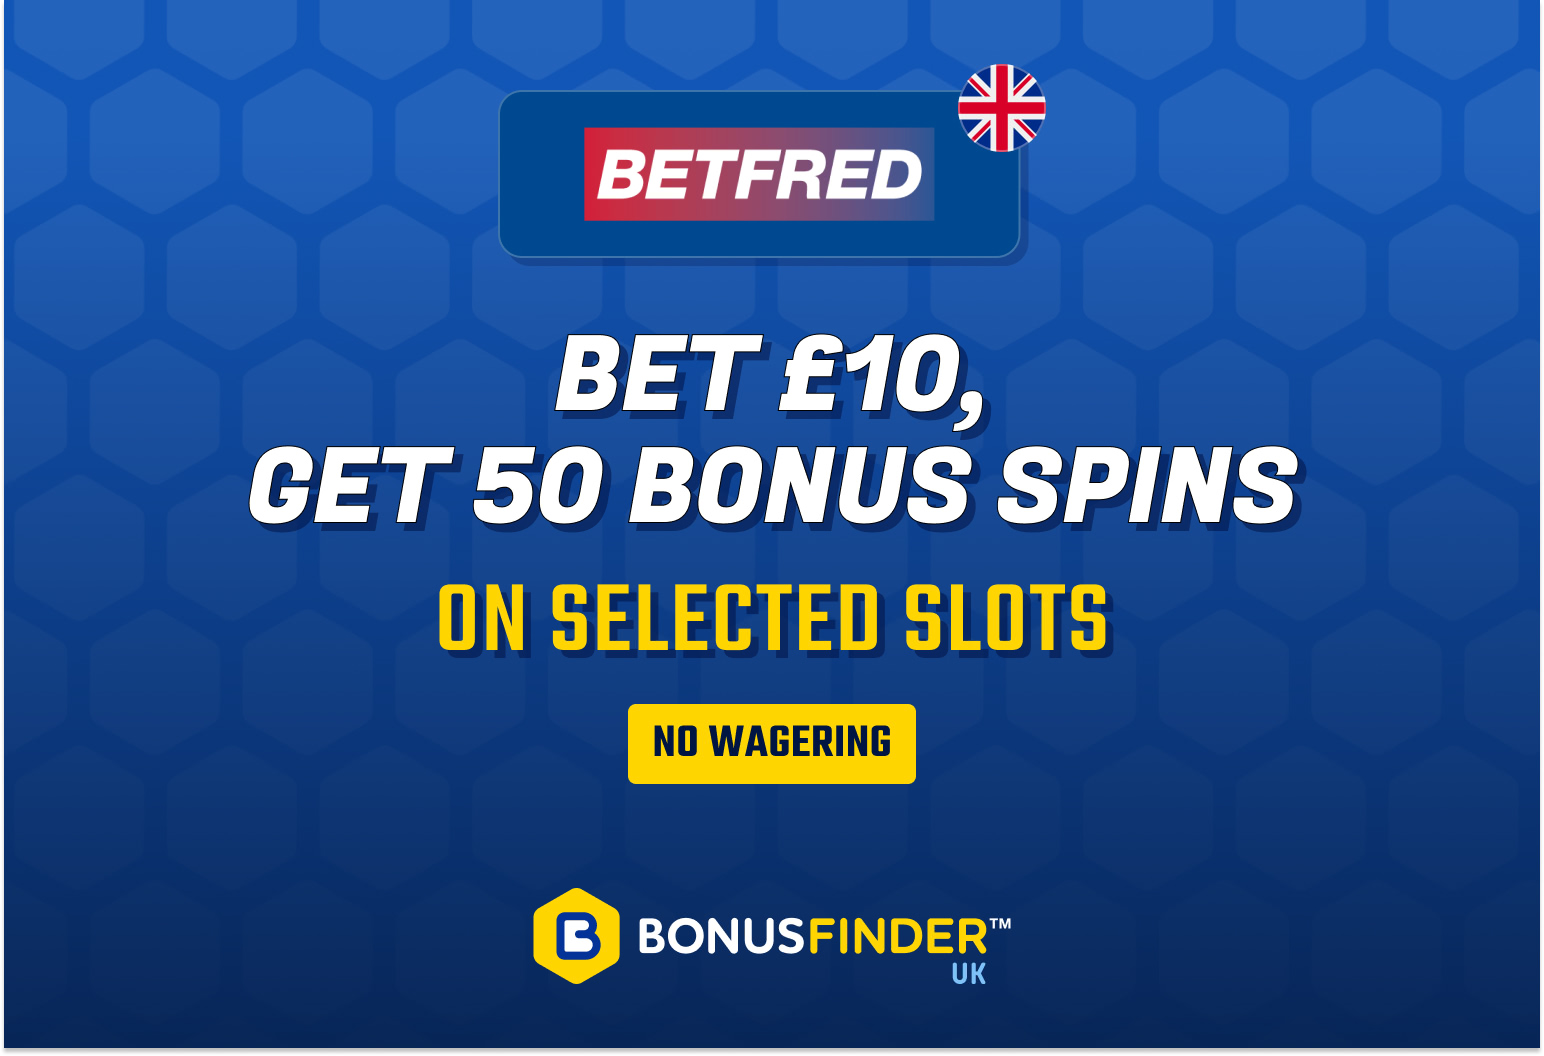 Betfred free spins casino bonus offer